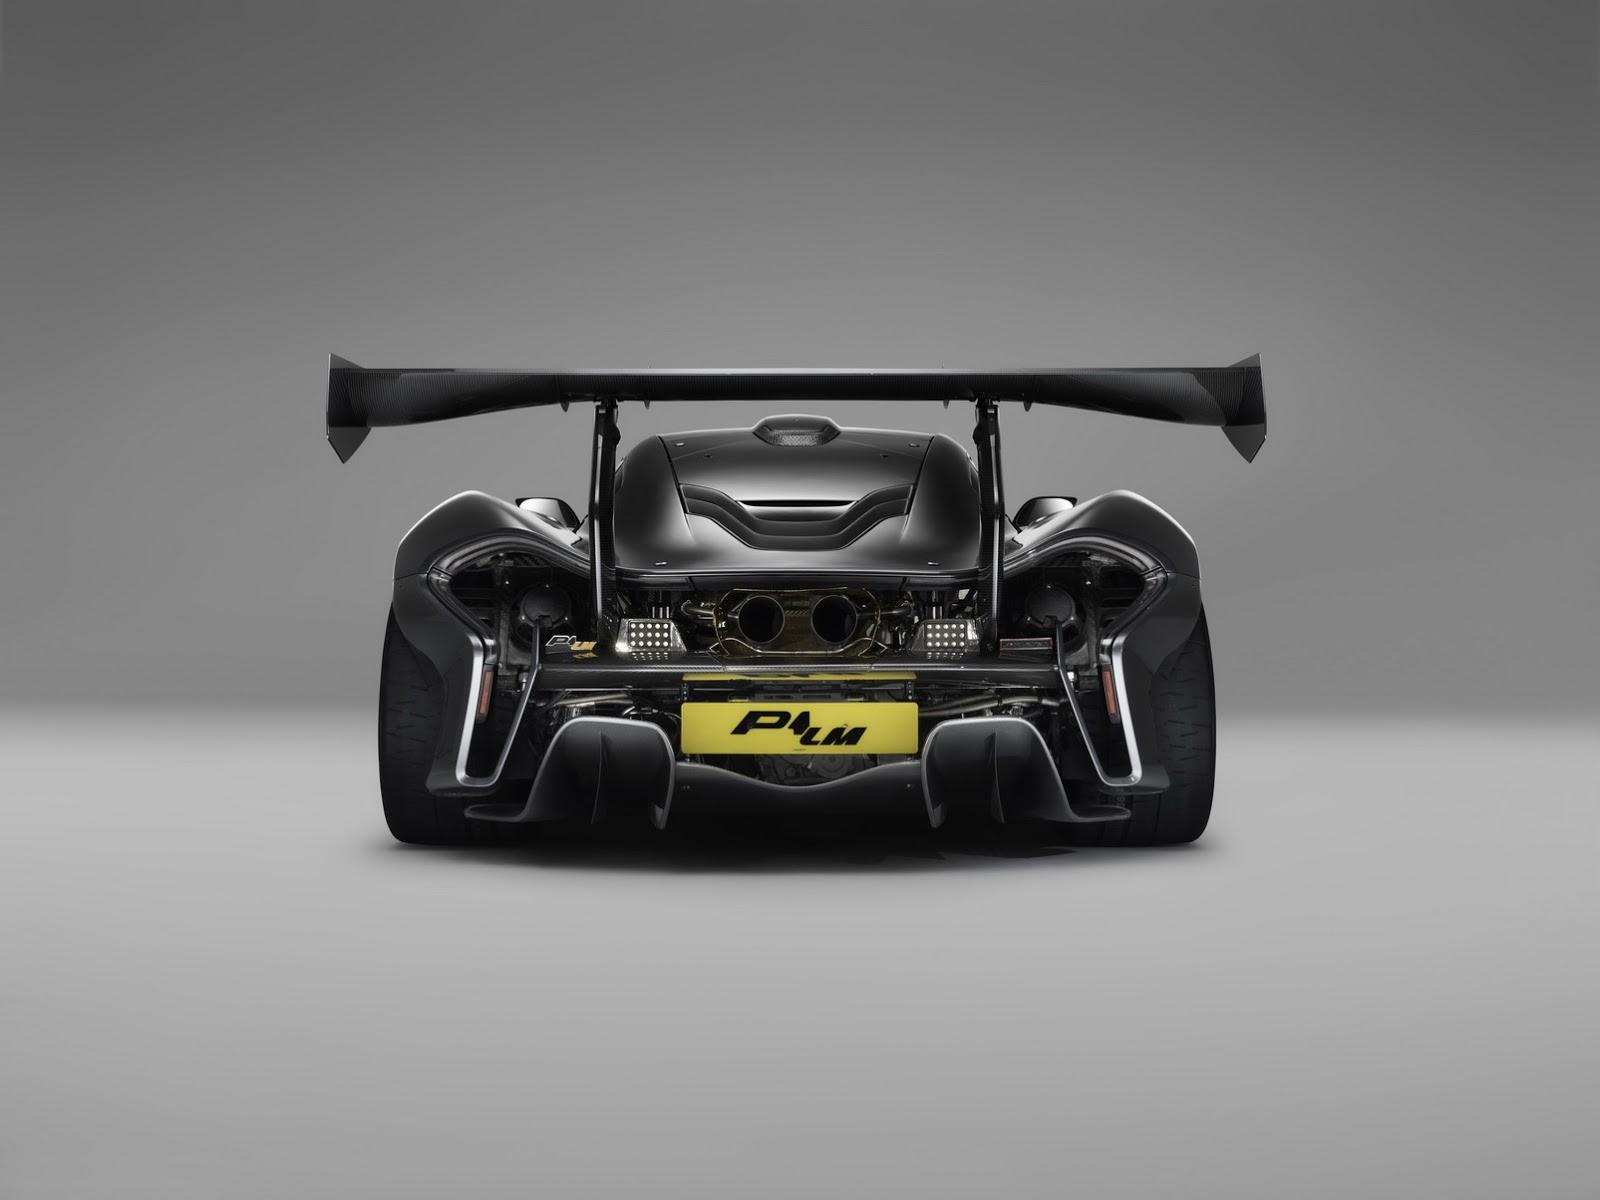 McLaren_P1_LM_Prototype_04